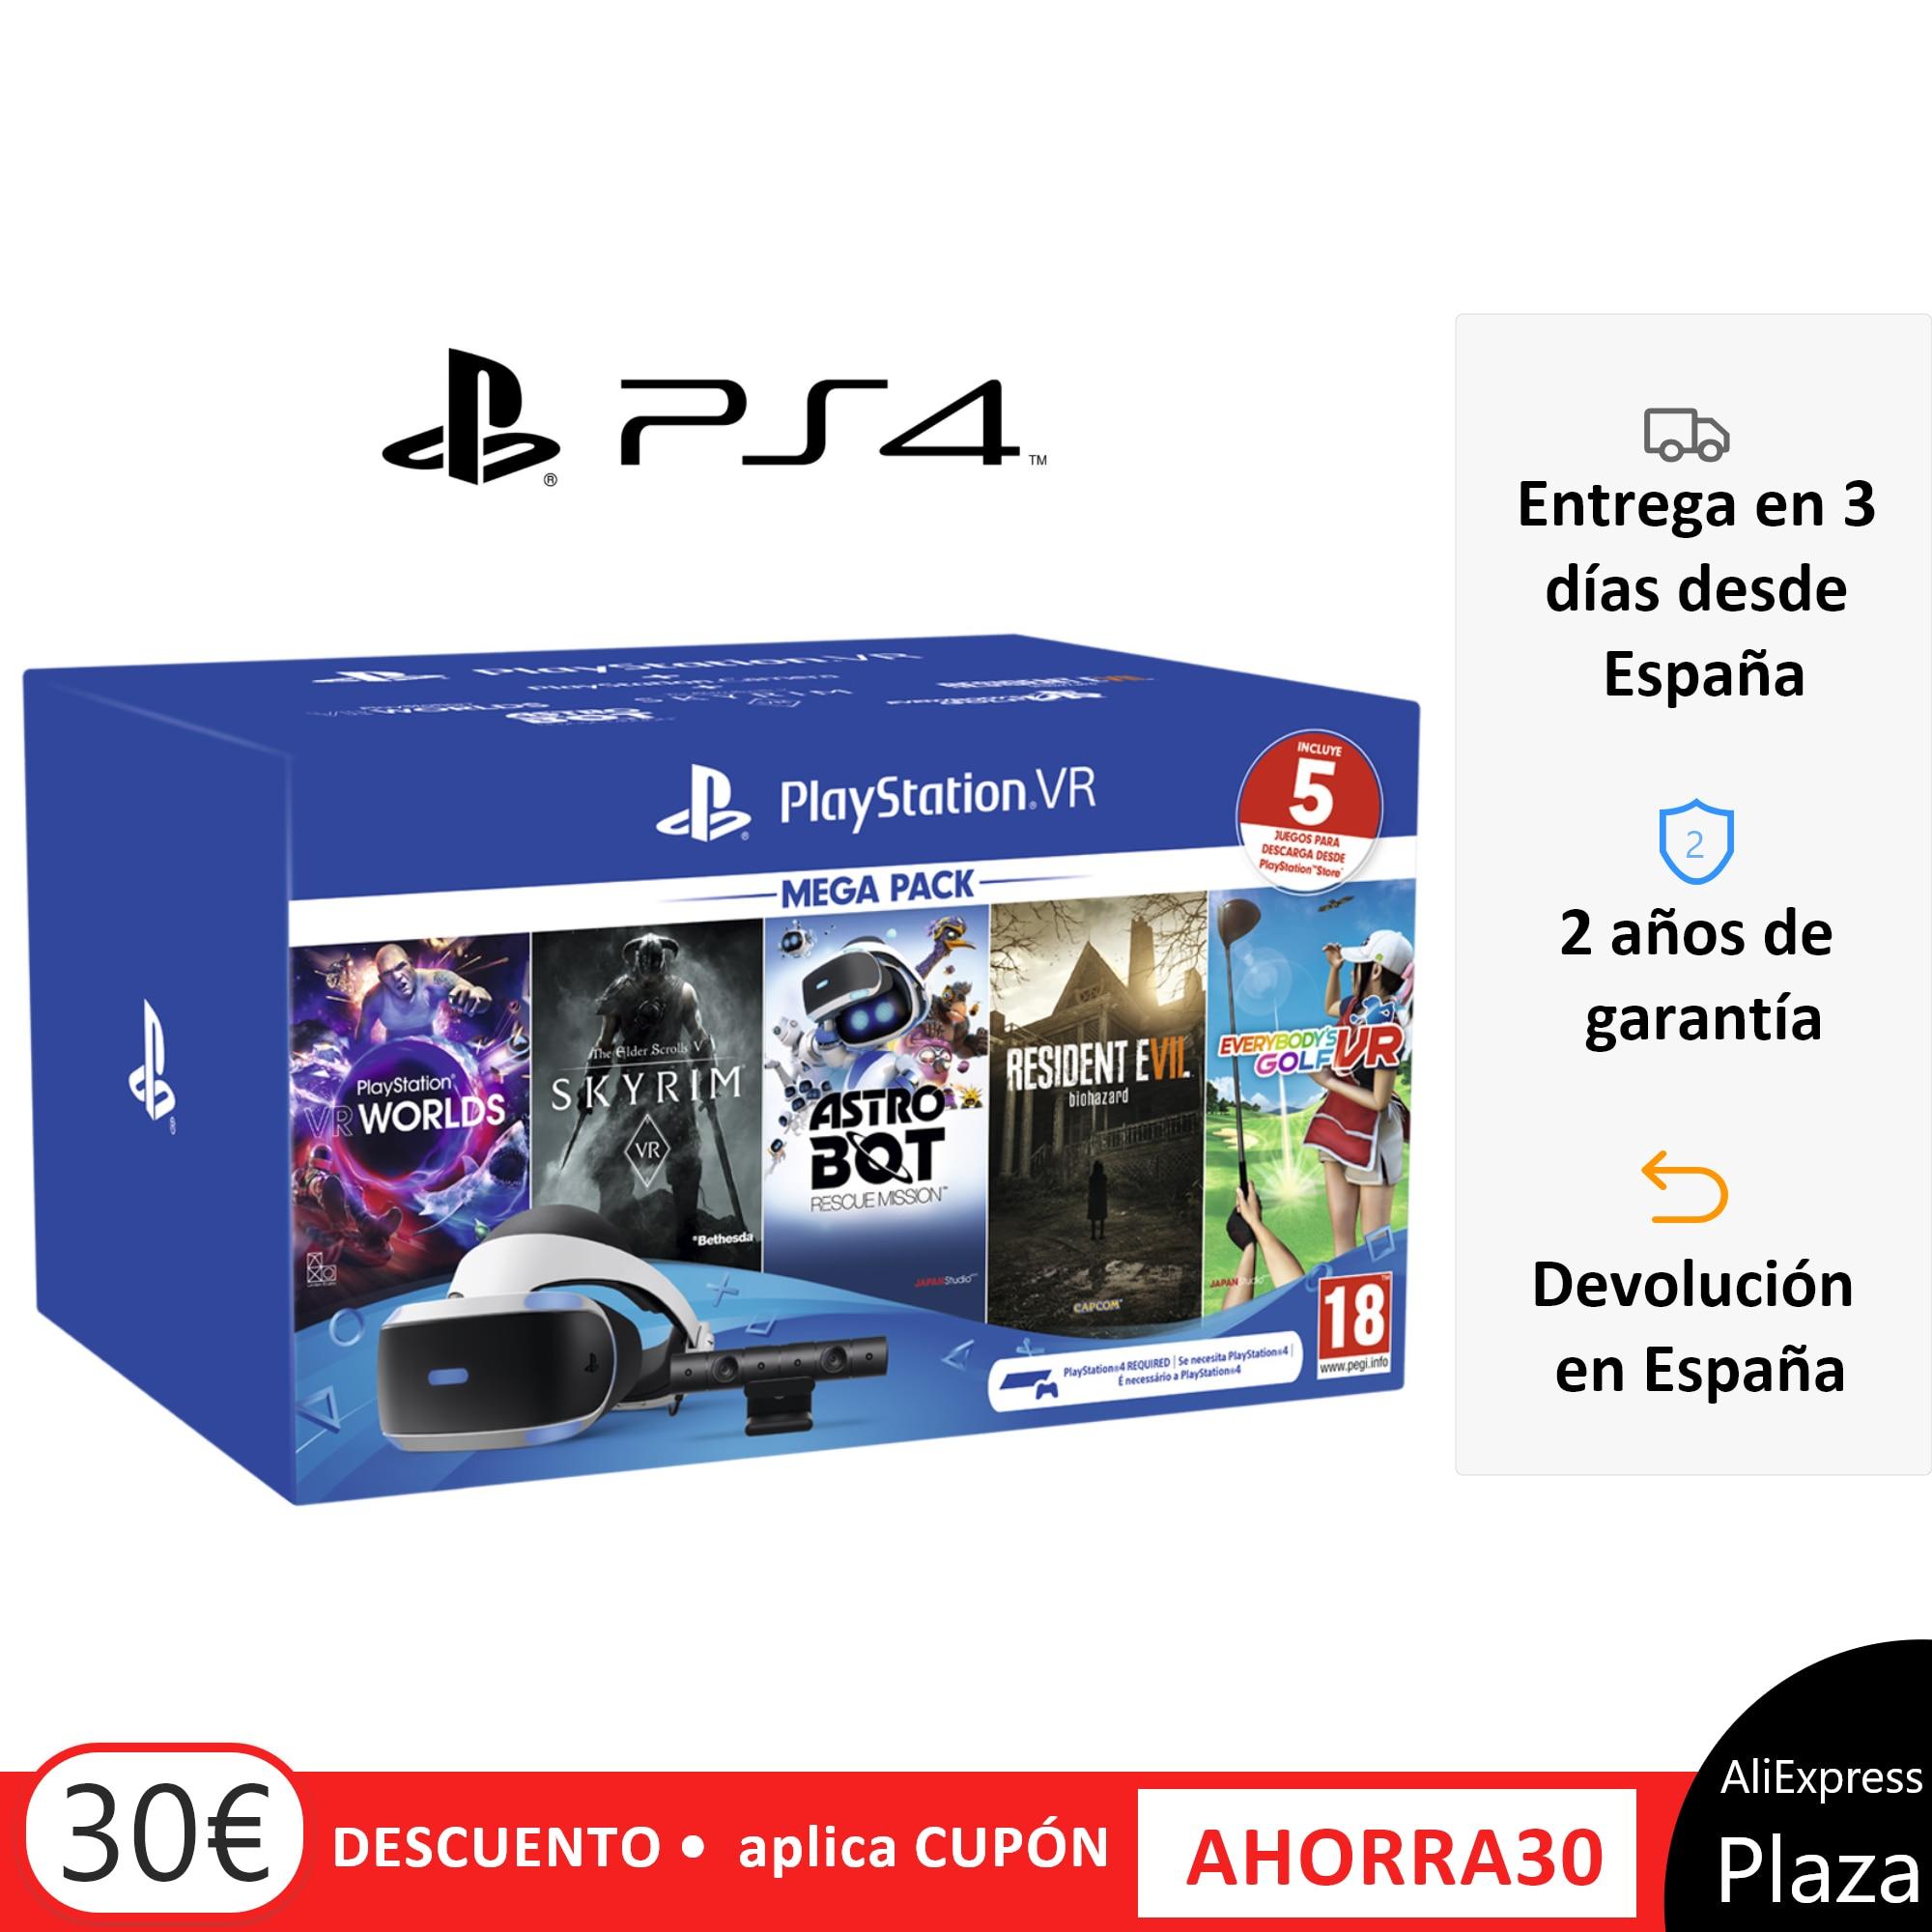 PlayStation VR Megapack 5 Sets Fishing Game Fox Ps4 Age 16 +